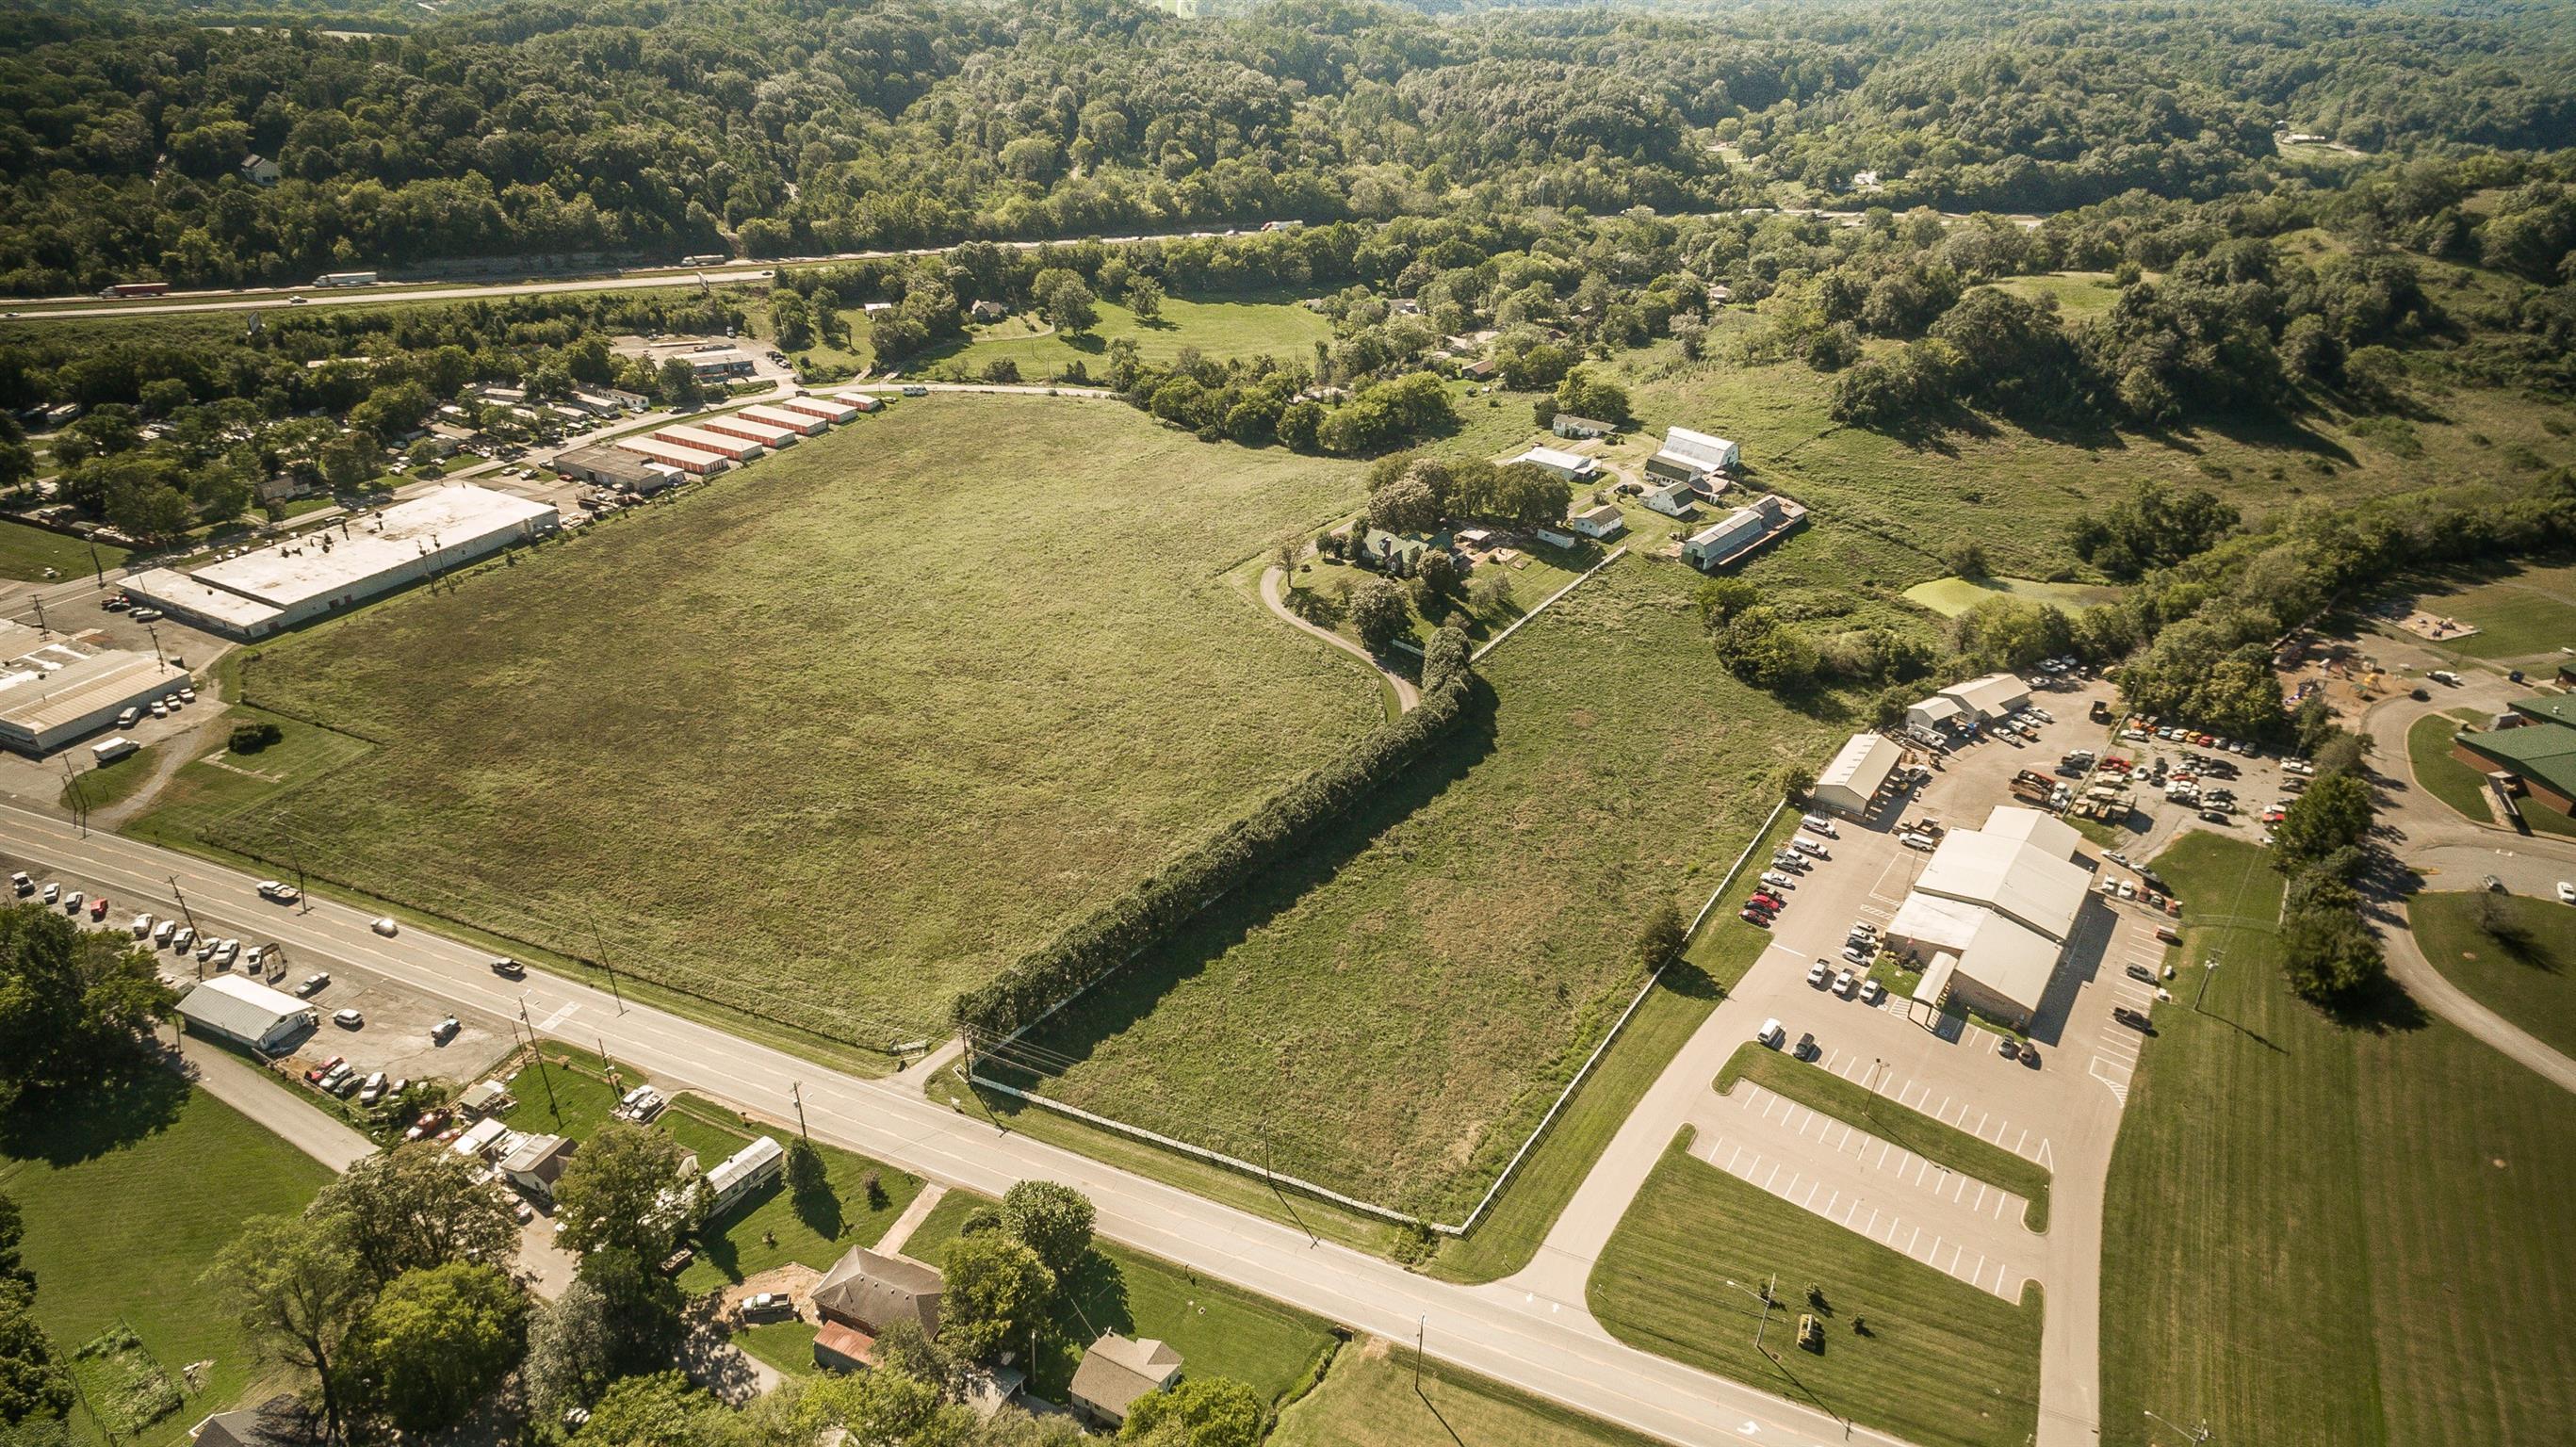 1228 Louisville Hwy, Goodlettsville, TN 37072 - Goodlettsville, TN real estate listing